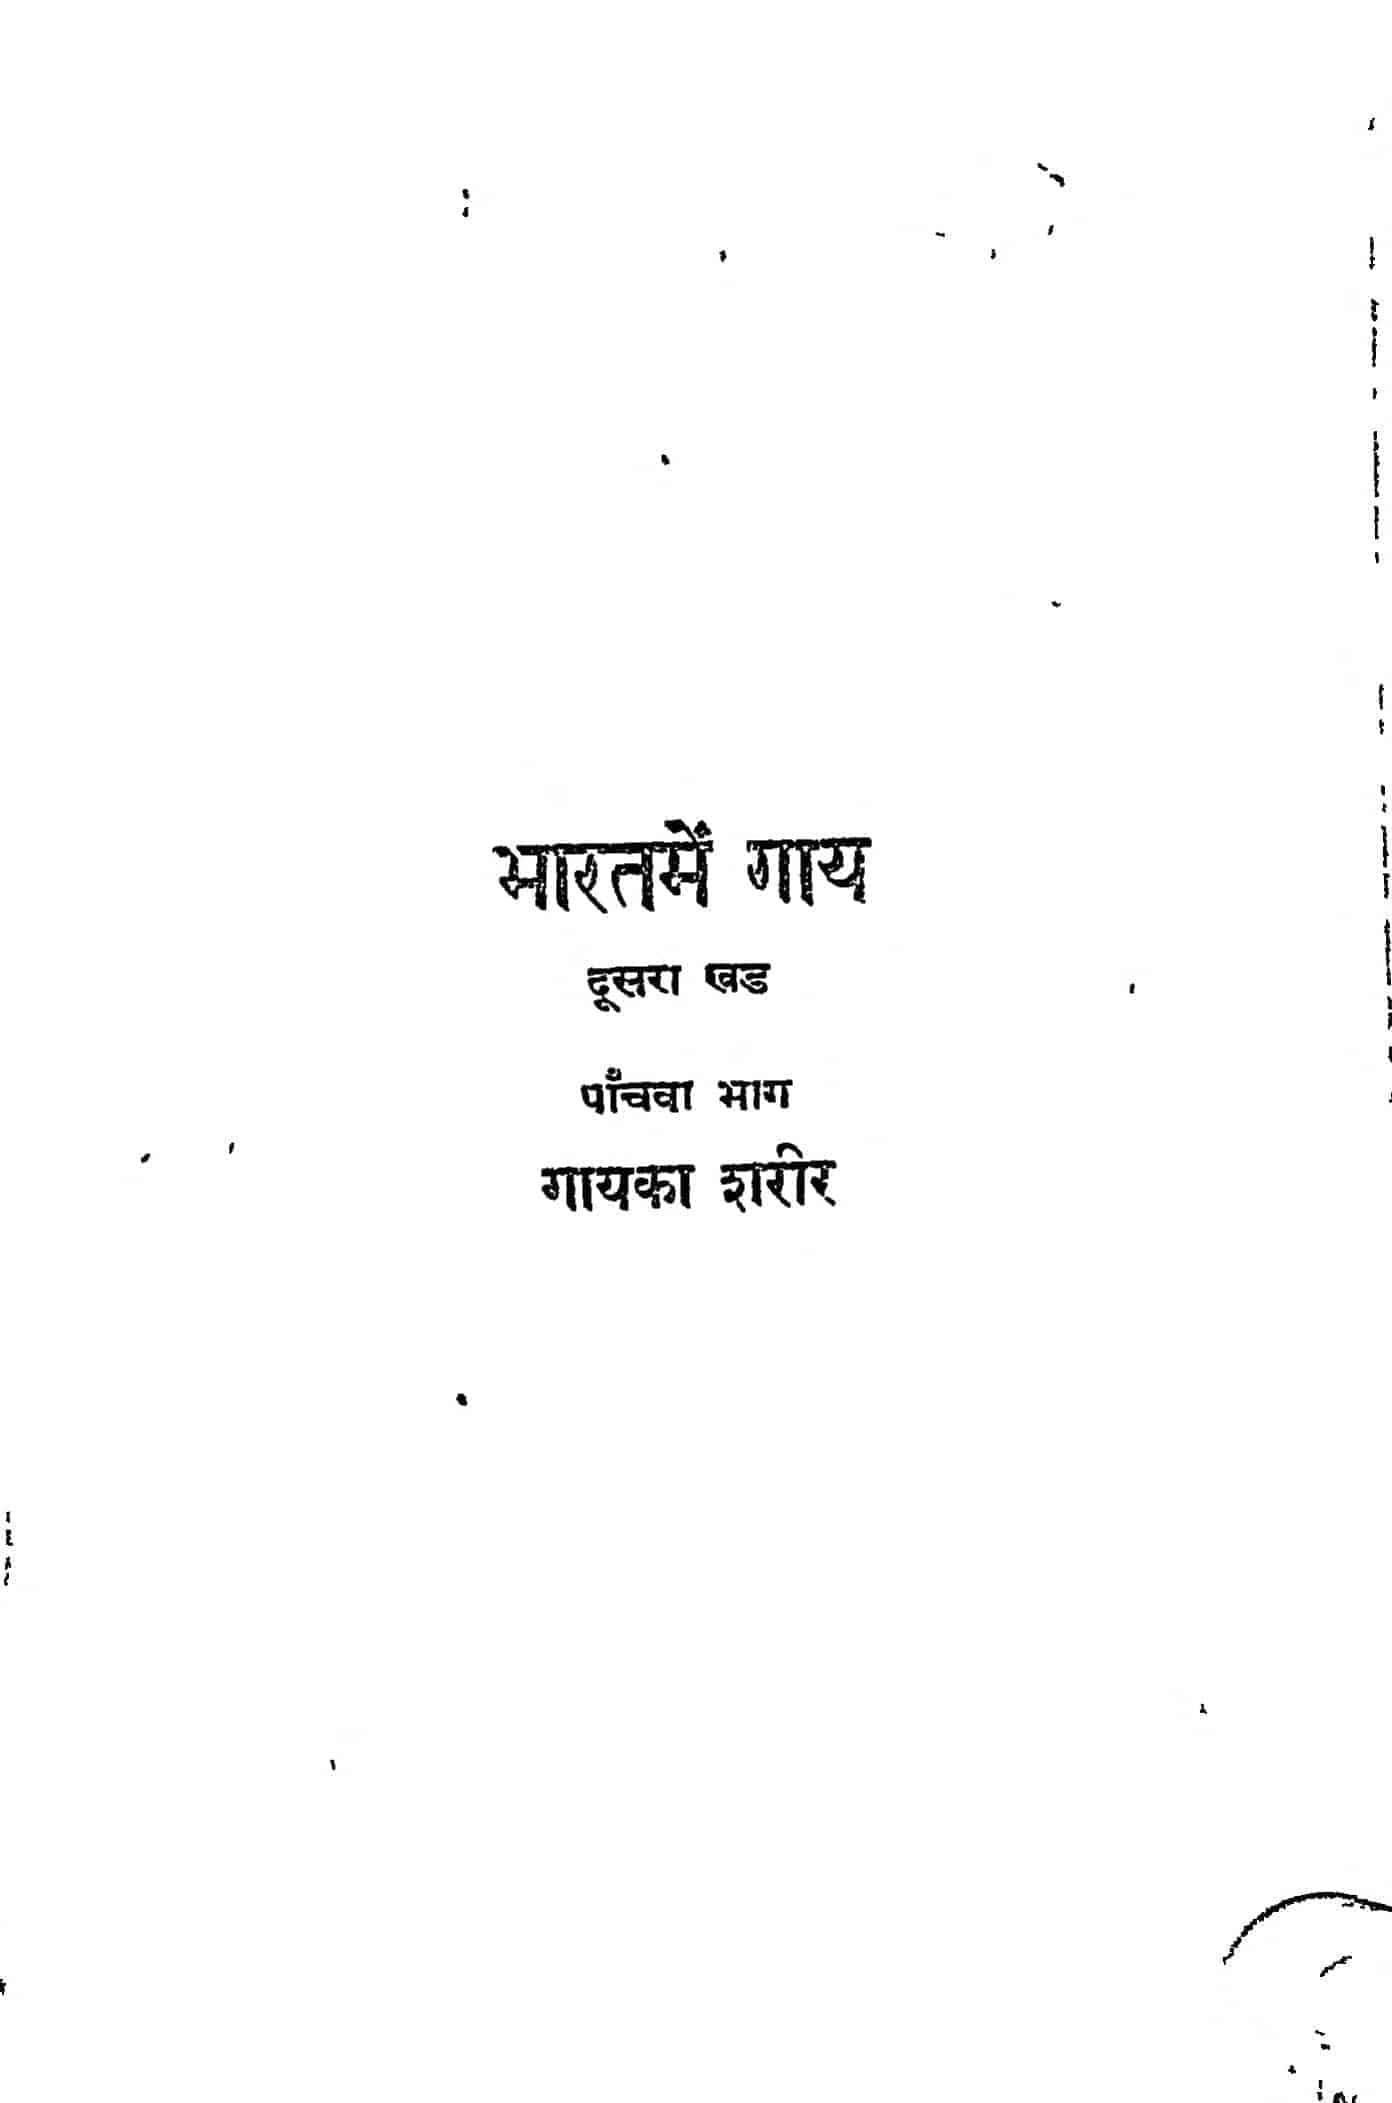 Book Image : भारत  में गये भाग 1  - Harat Main Gay Bhag 1